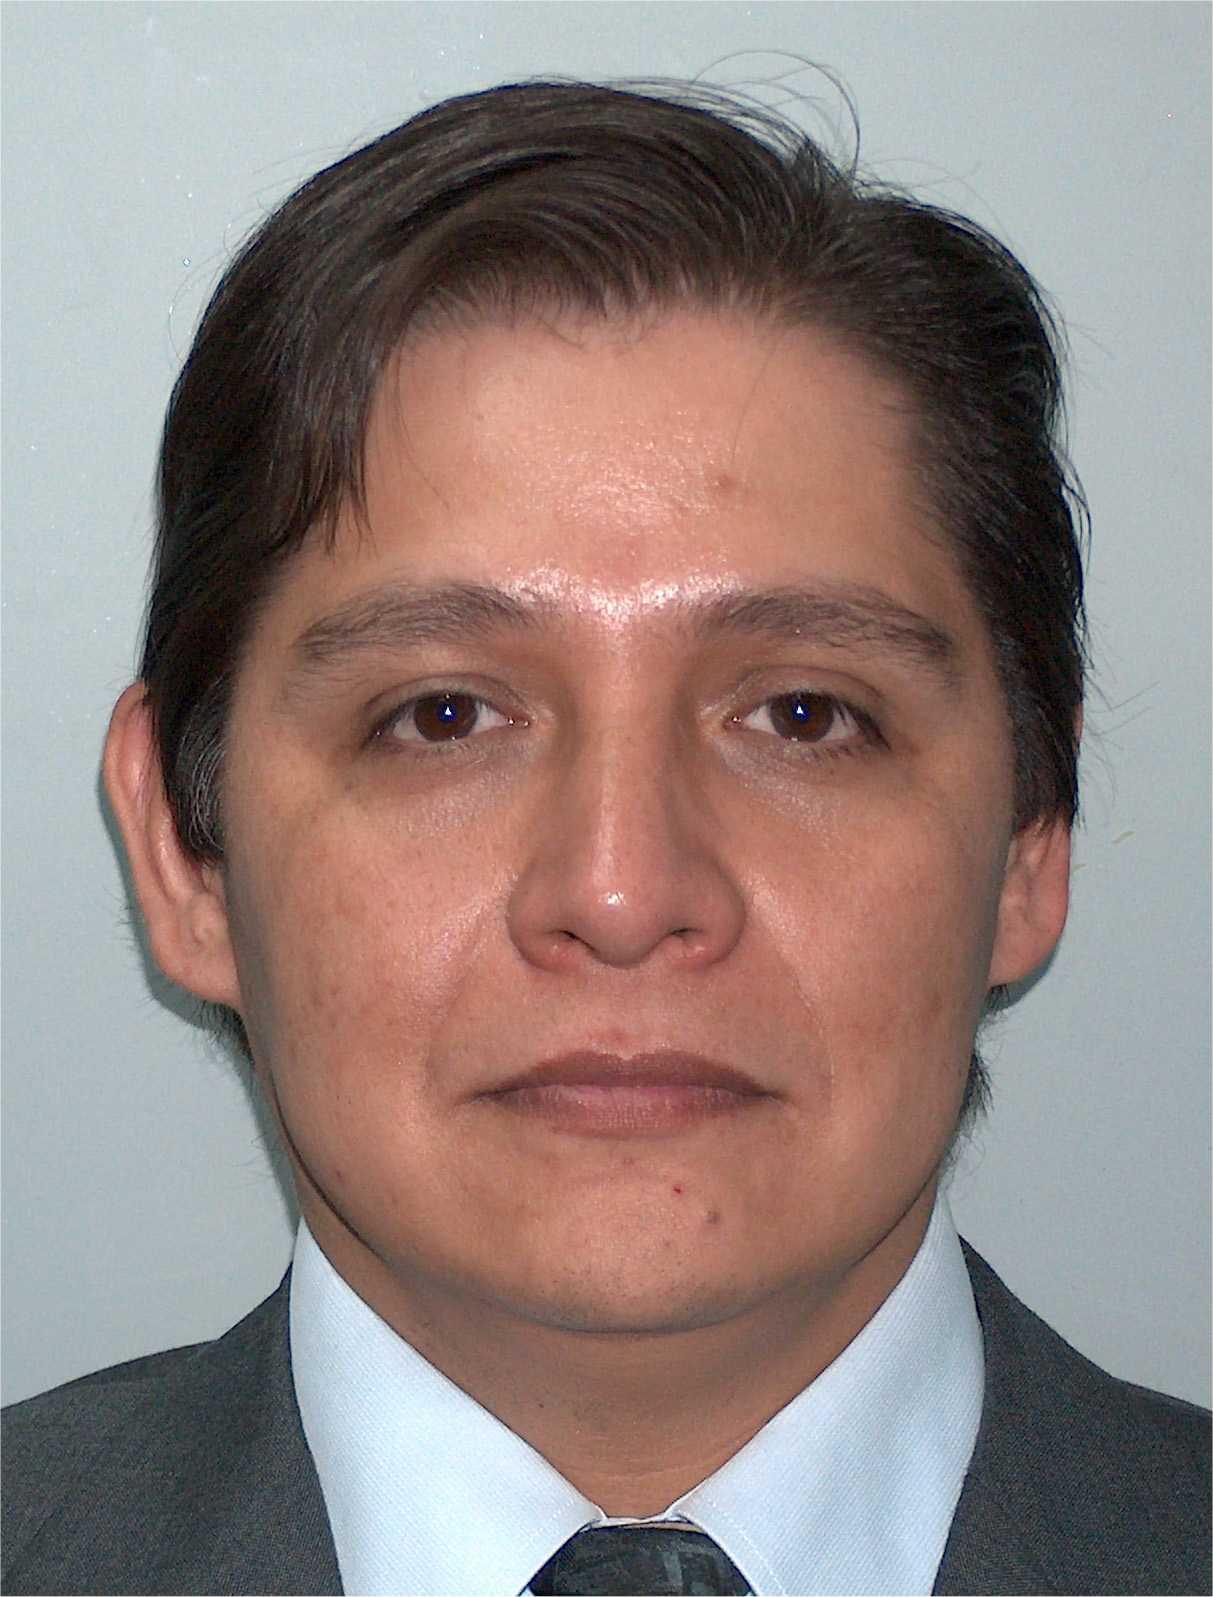 Lic. JOSE LUIS JANITZIO MEDINA FLORES: http://www.paginaspersonales.unam.mx/presentacions/index/M